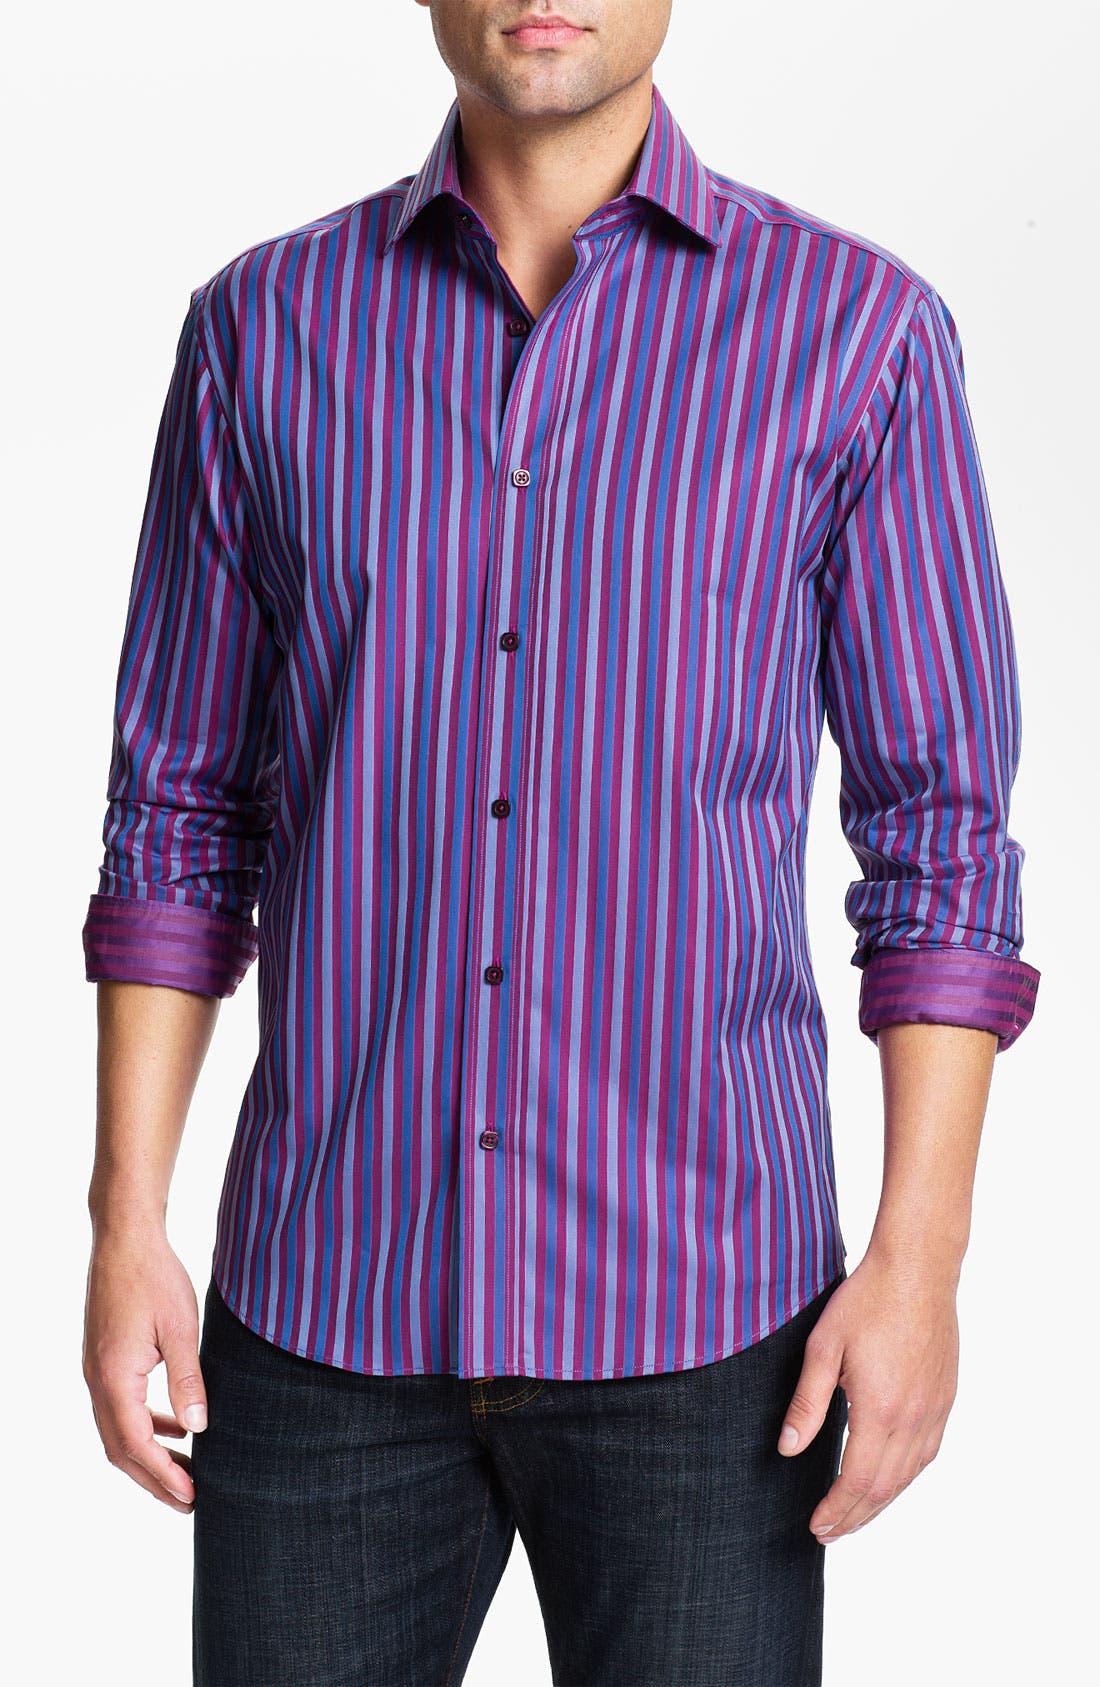 Alternate Image 1 Selected - Bugatchi Uomo Shaped Fit Sport Shirt